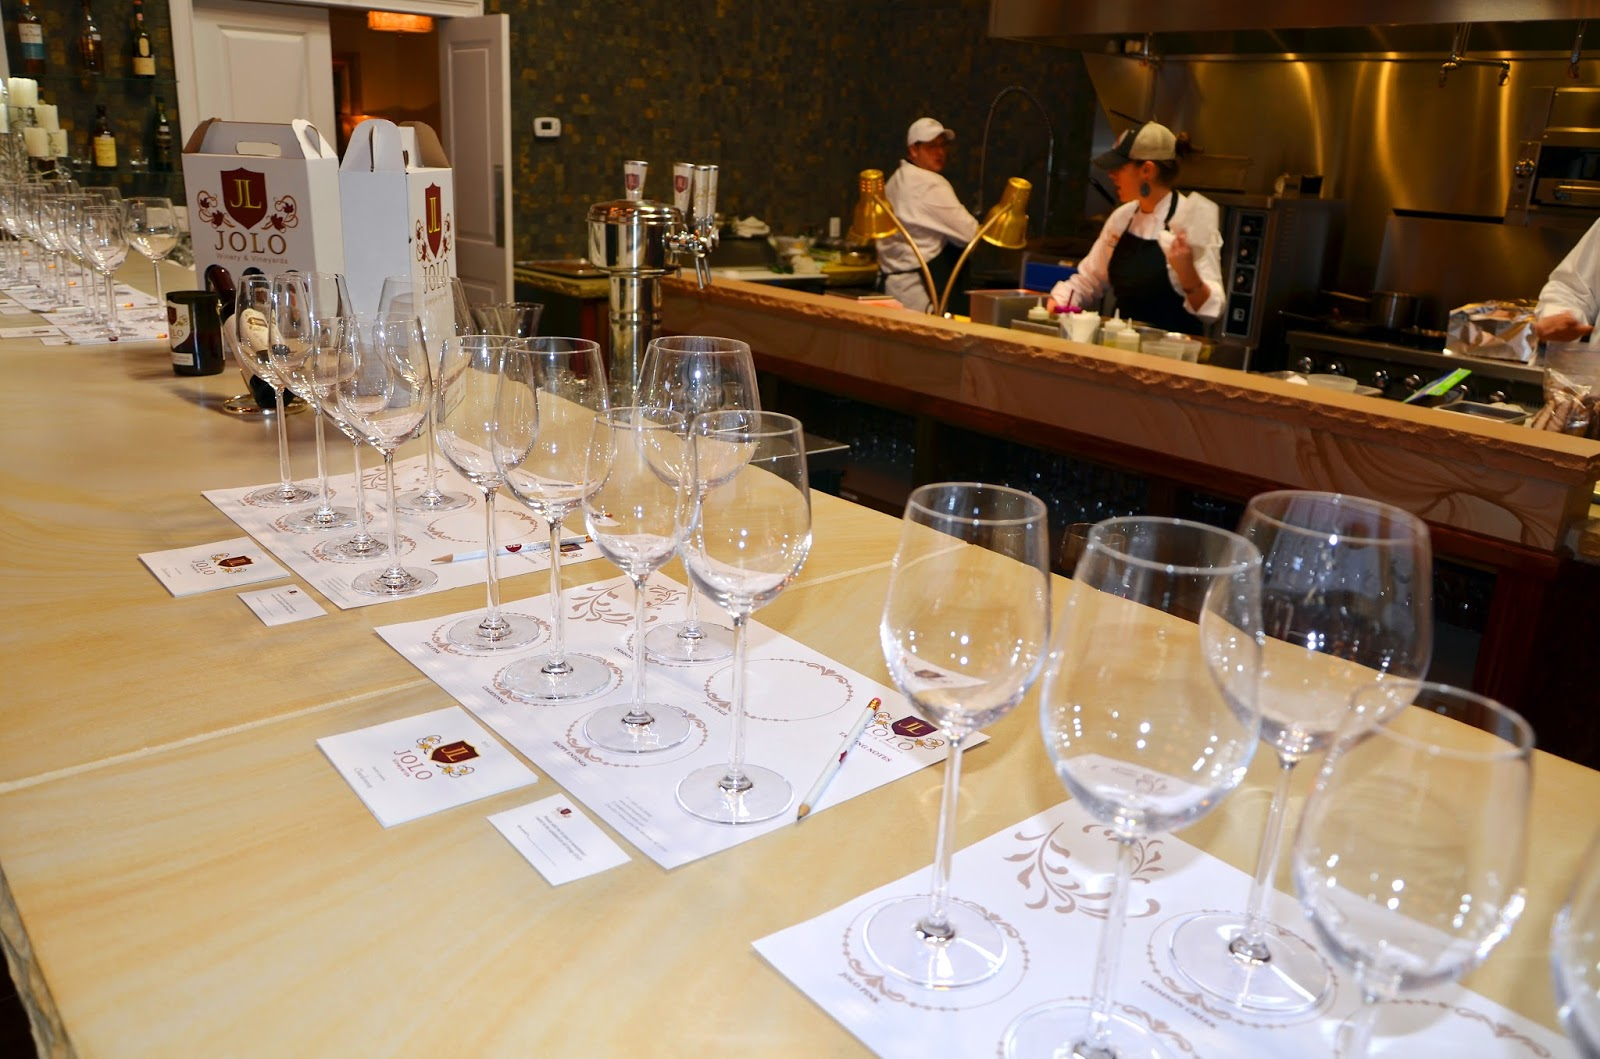 Jolo Winery Wine Tasting.JPG